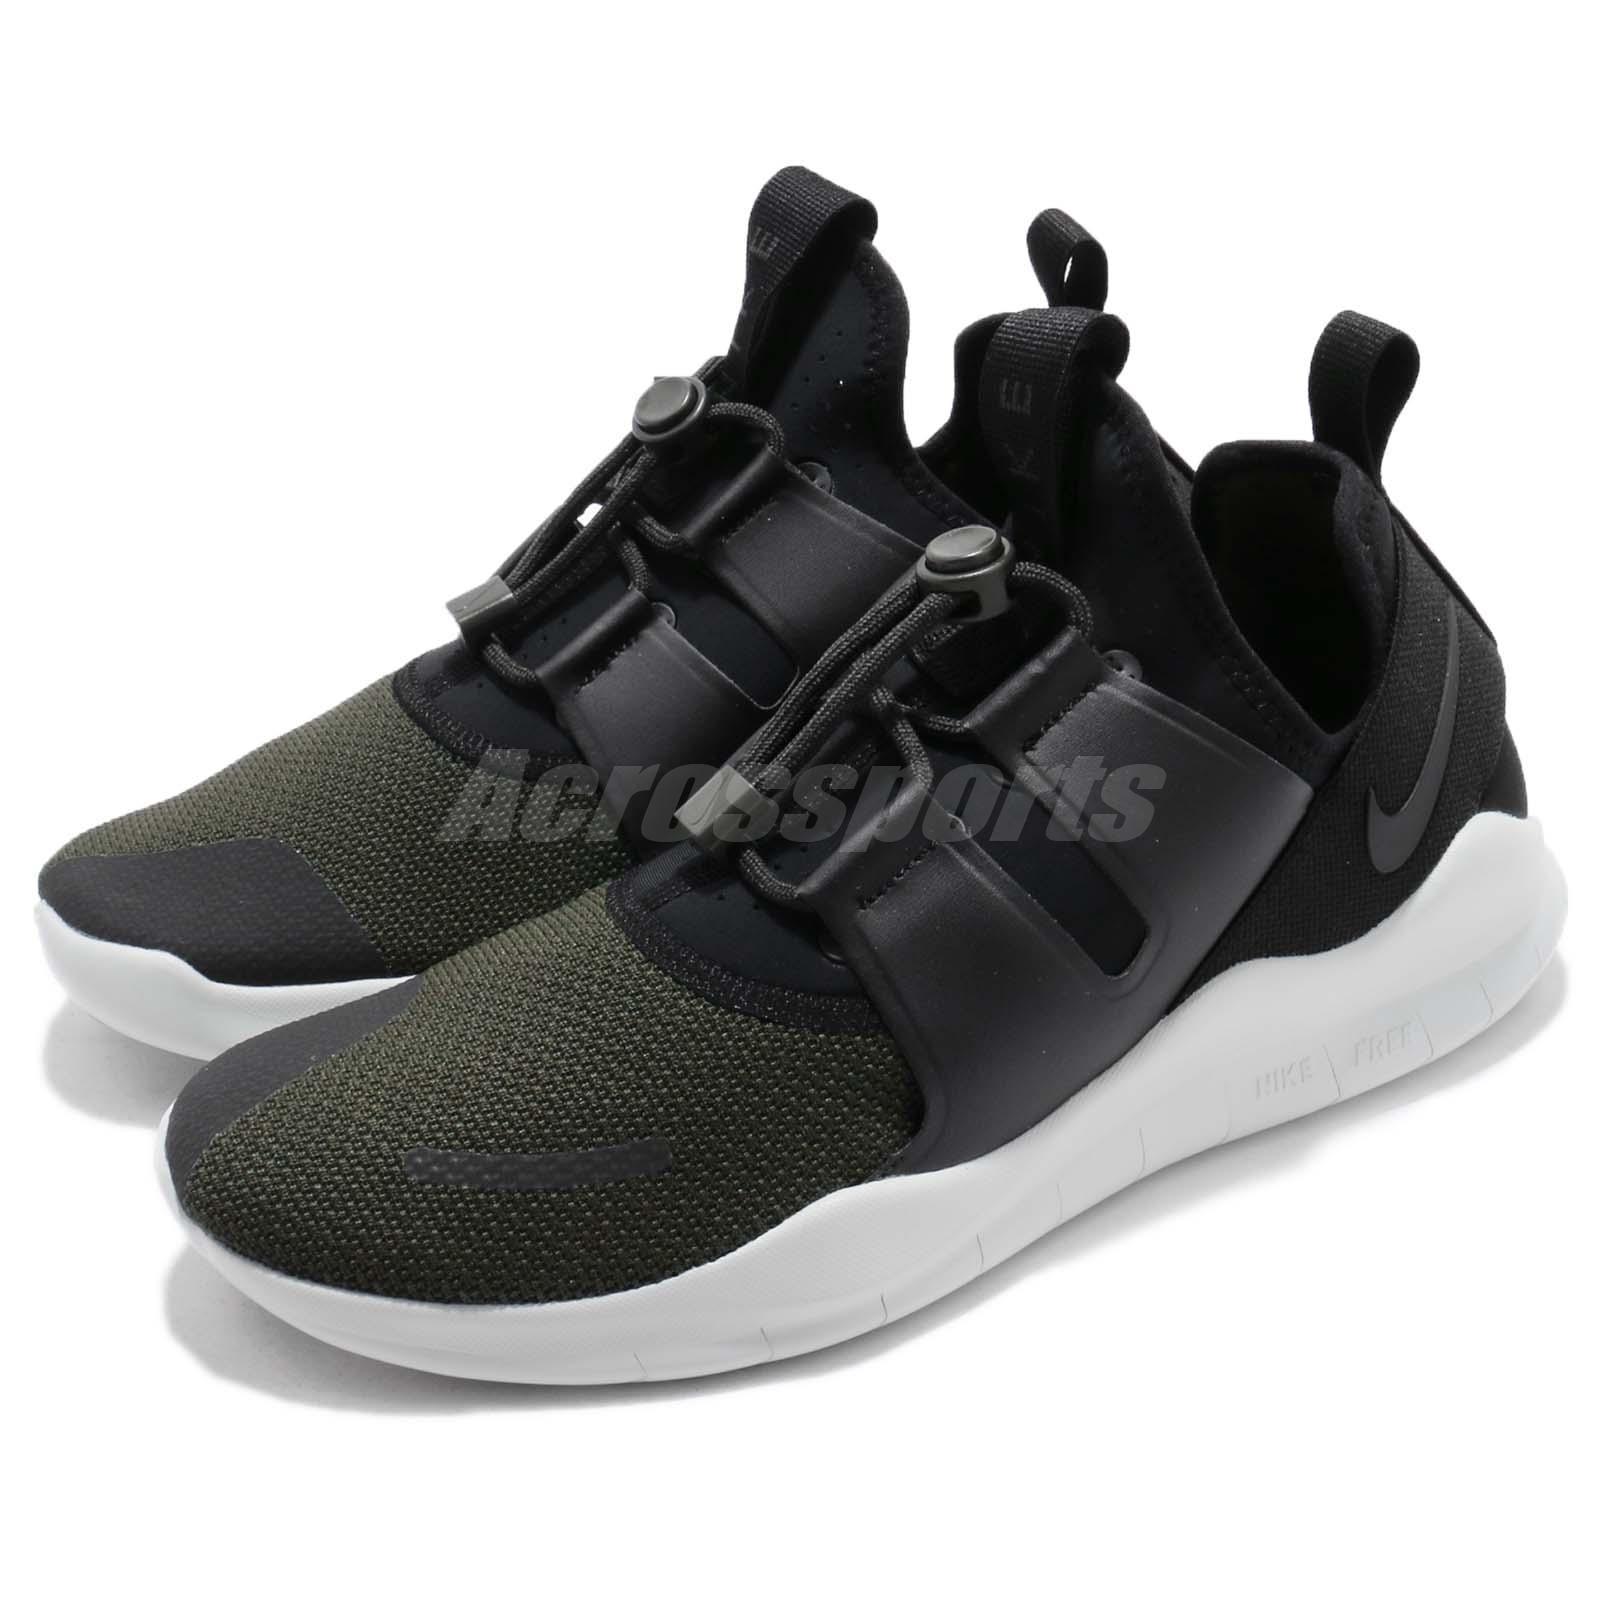 0897447df9e8e Details about Nike Free RN CMTR 2018 PRM Run Black Sequoia Men Running Shoe  Sneaker AJ8308-003